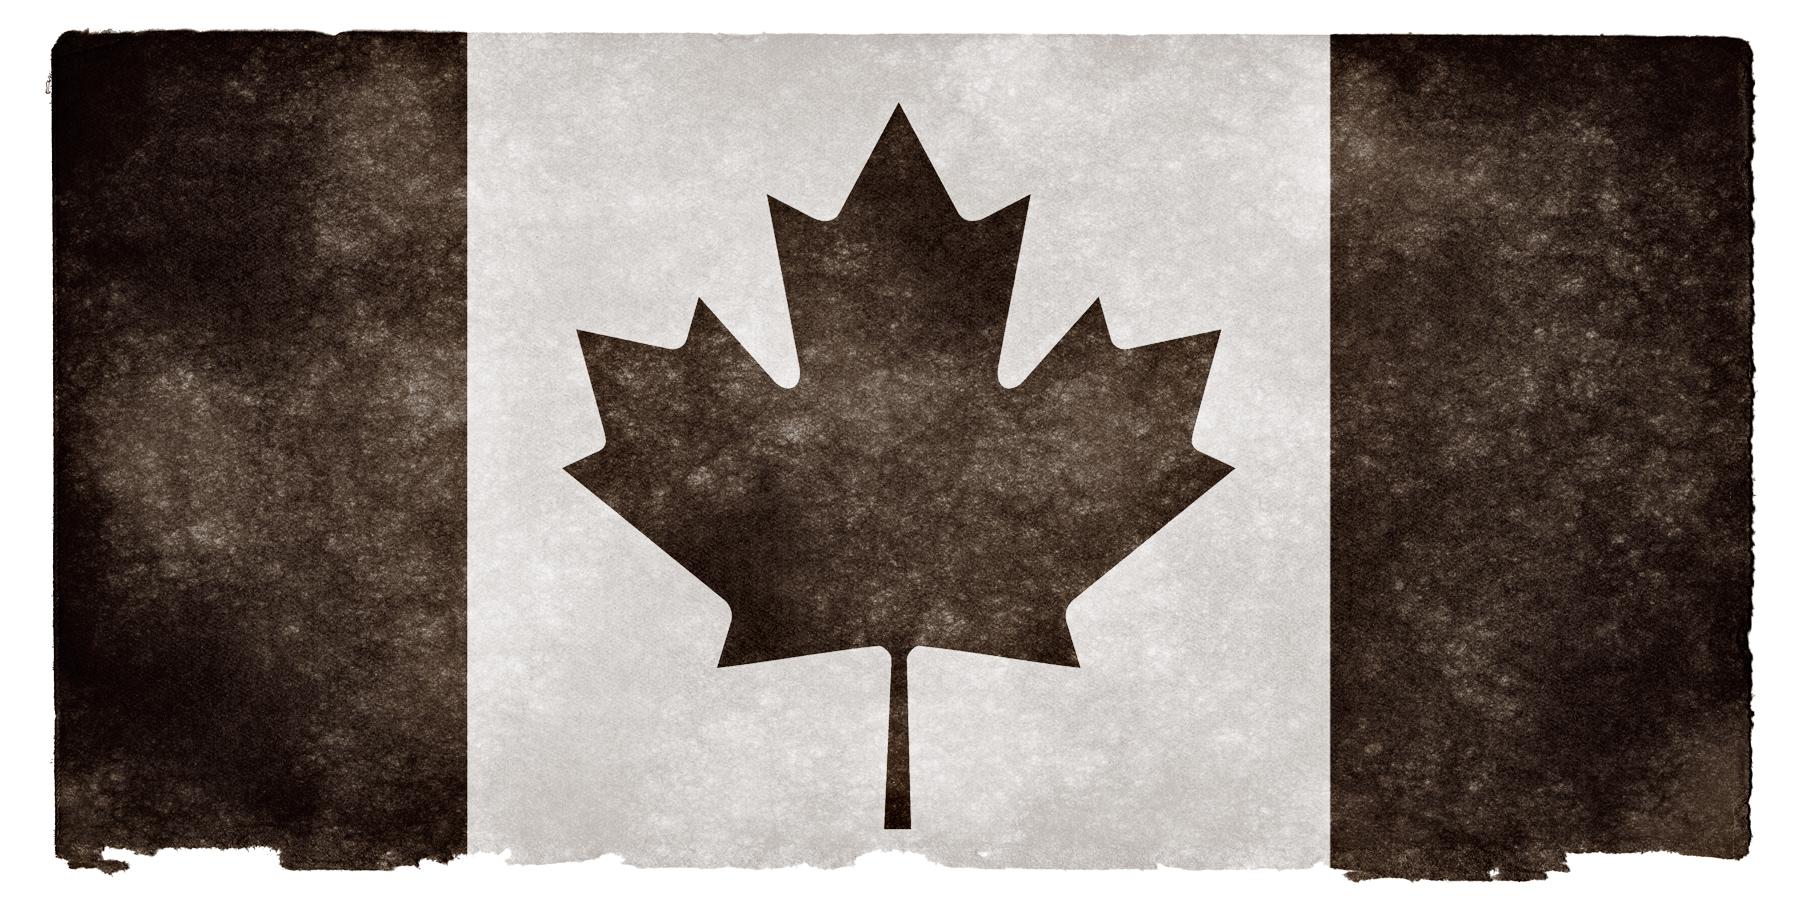 Canada Grunge Flag - Black and White, Aged, Picture, Mono-chromatic, Mono-chrome, HQ Photo